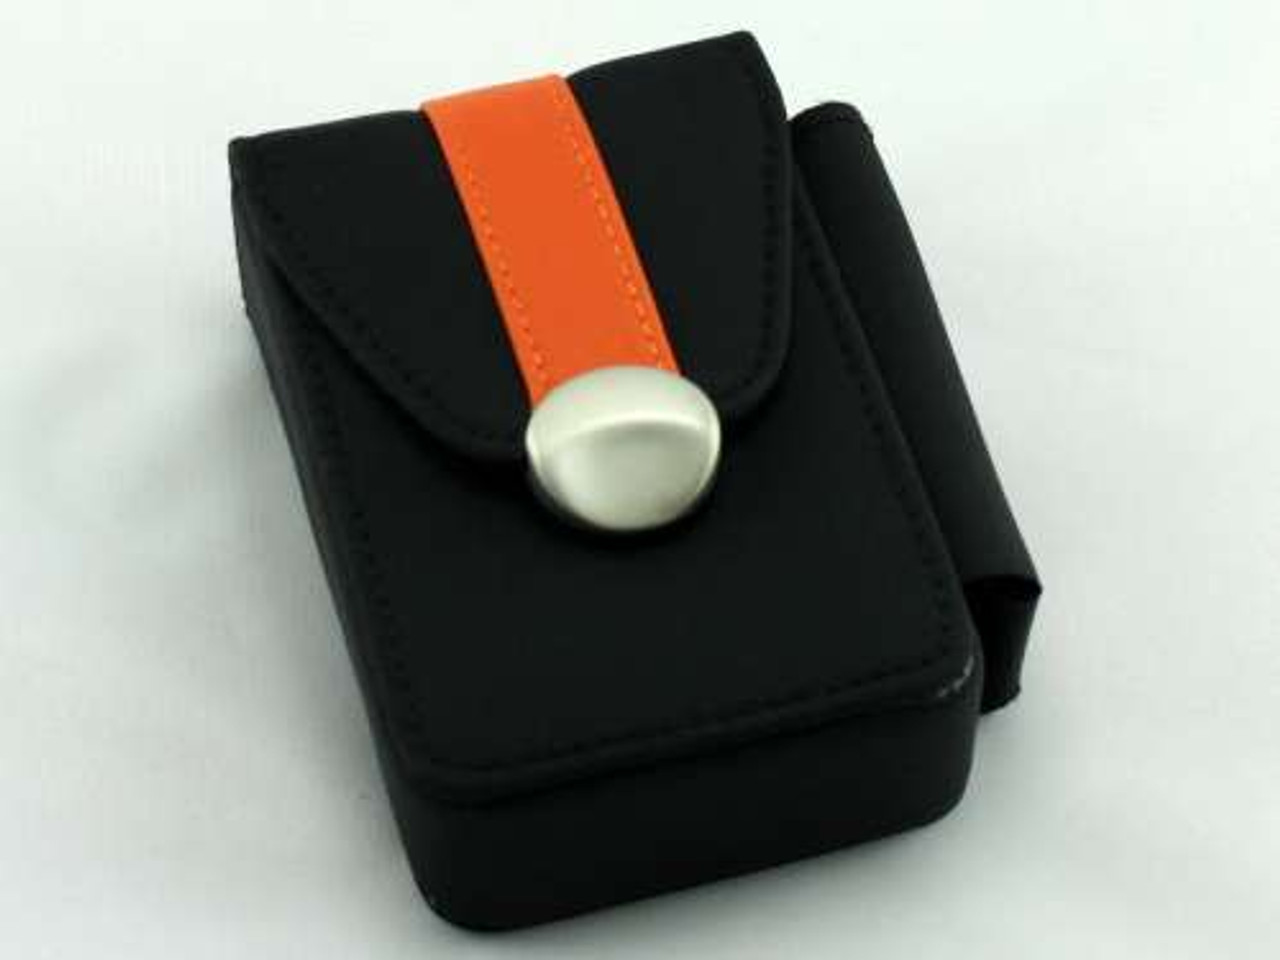 Orange Stripe Cigarette Pack Holder